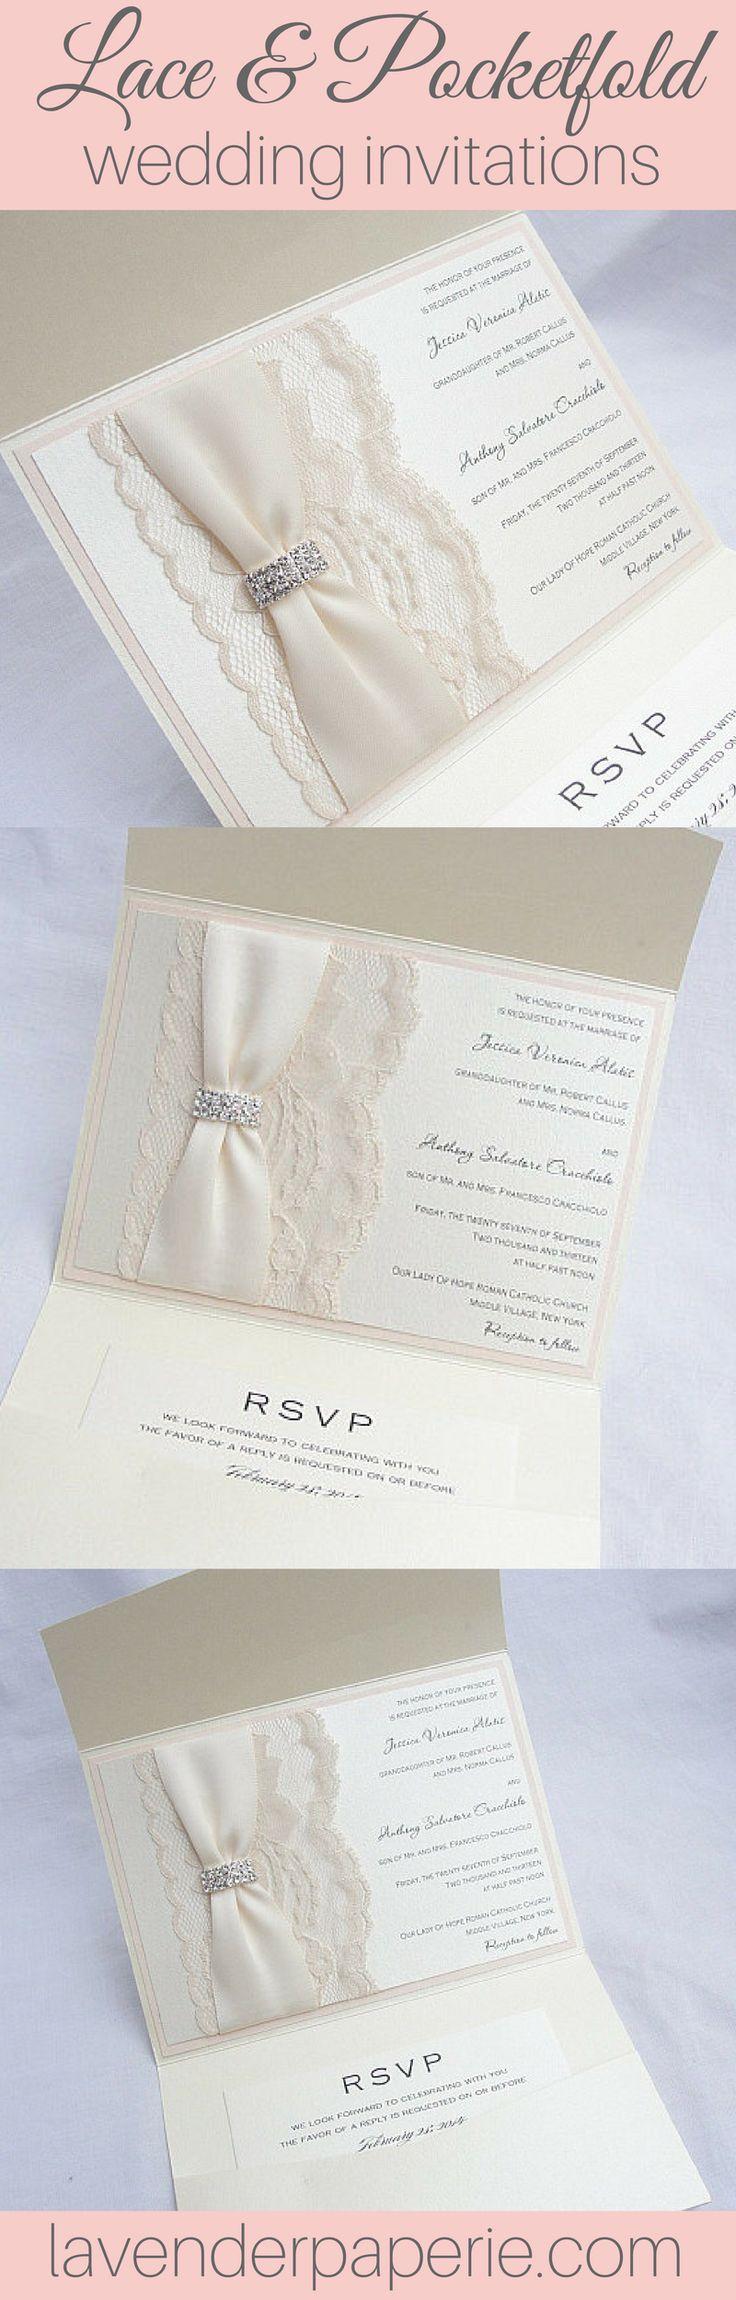 728 Best Luxury Wedding Ideas Images On Pinterest Luxury Wedding